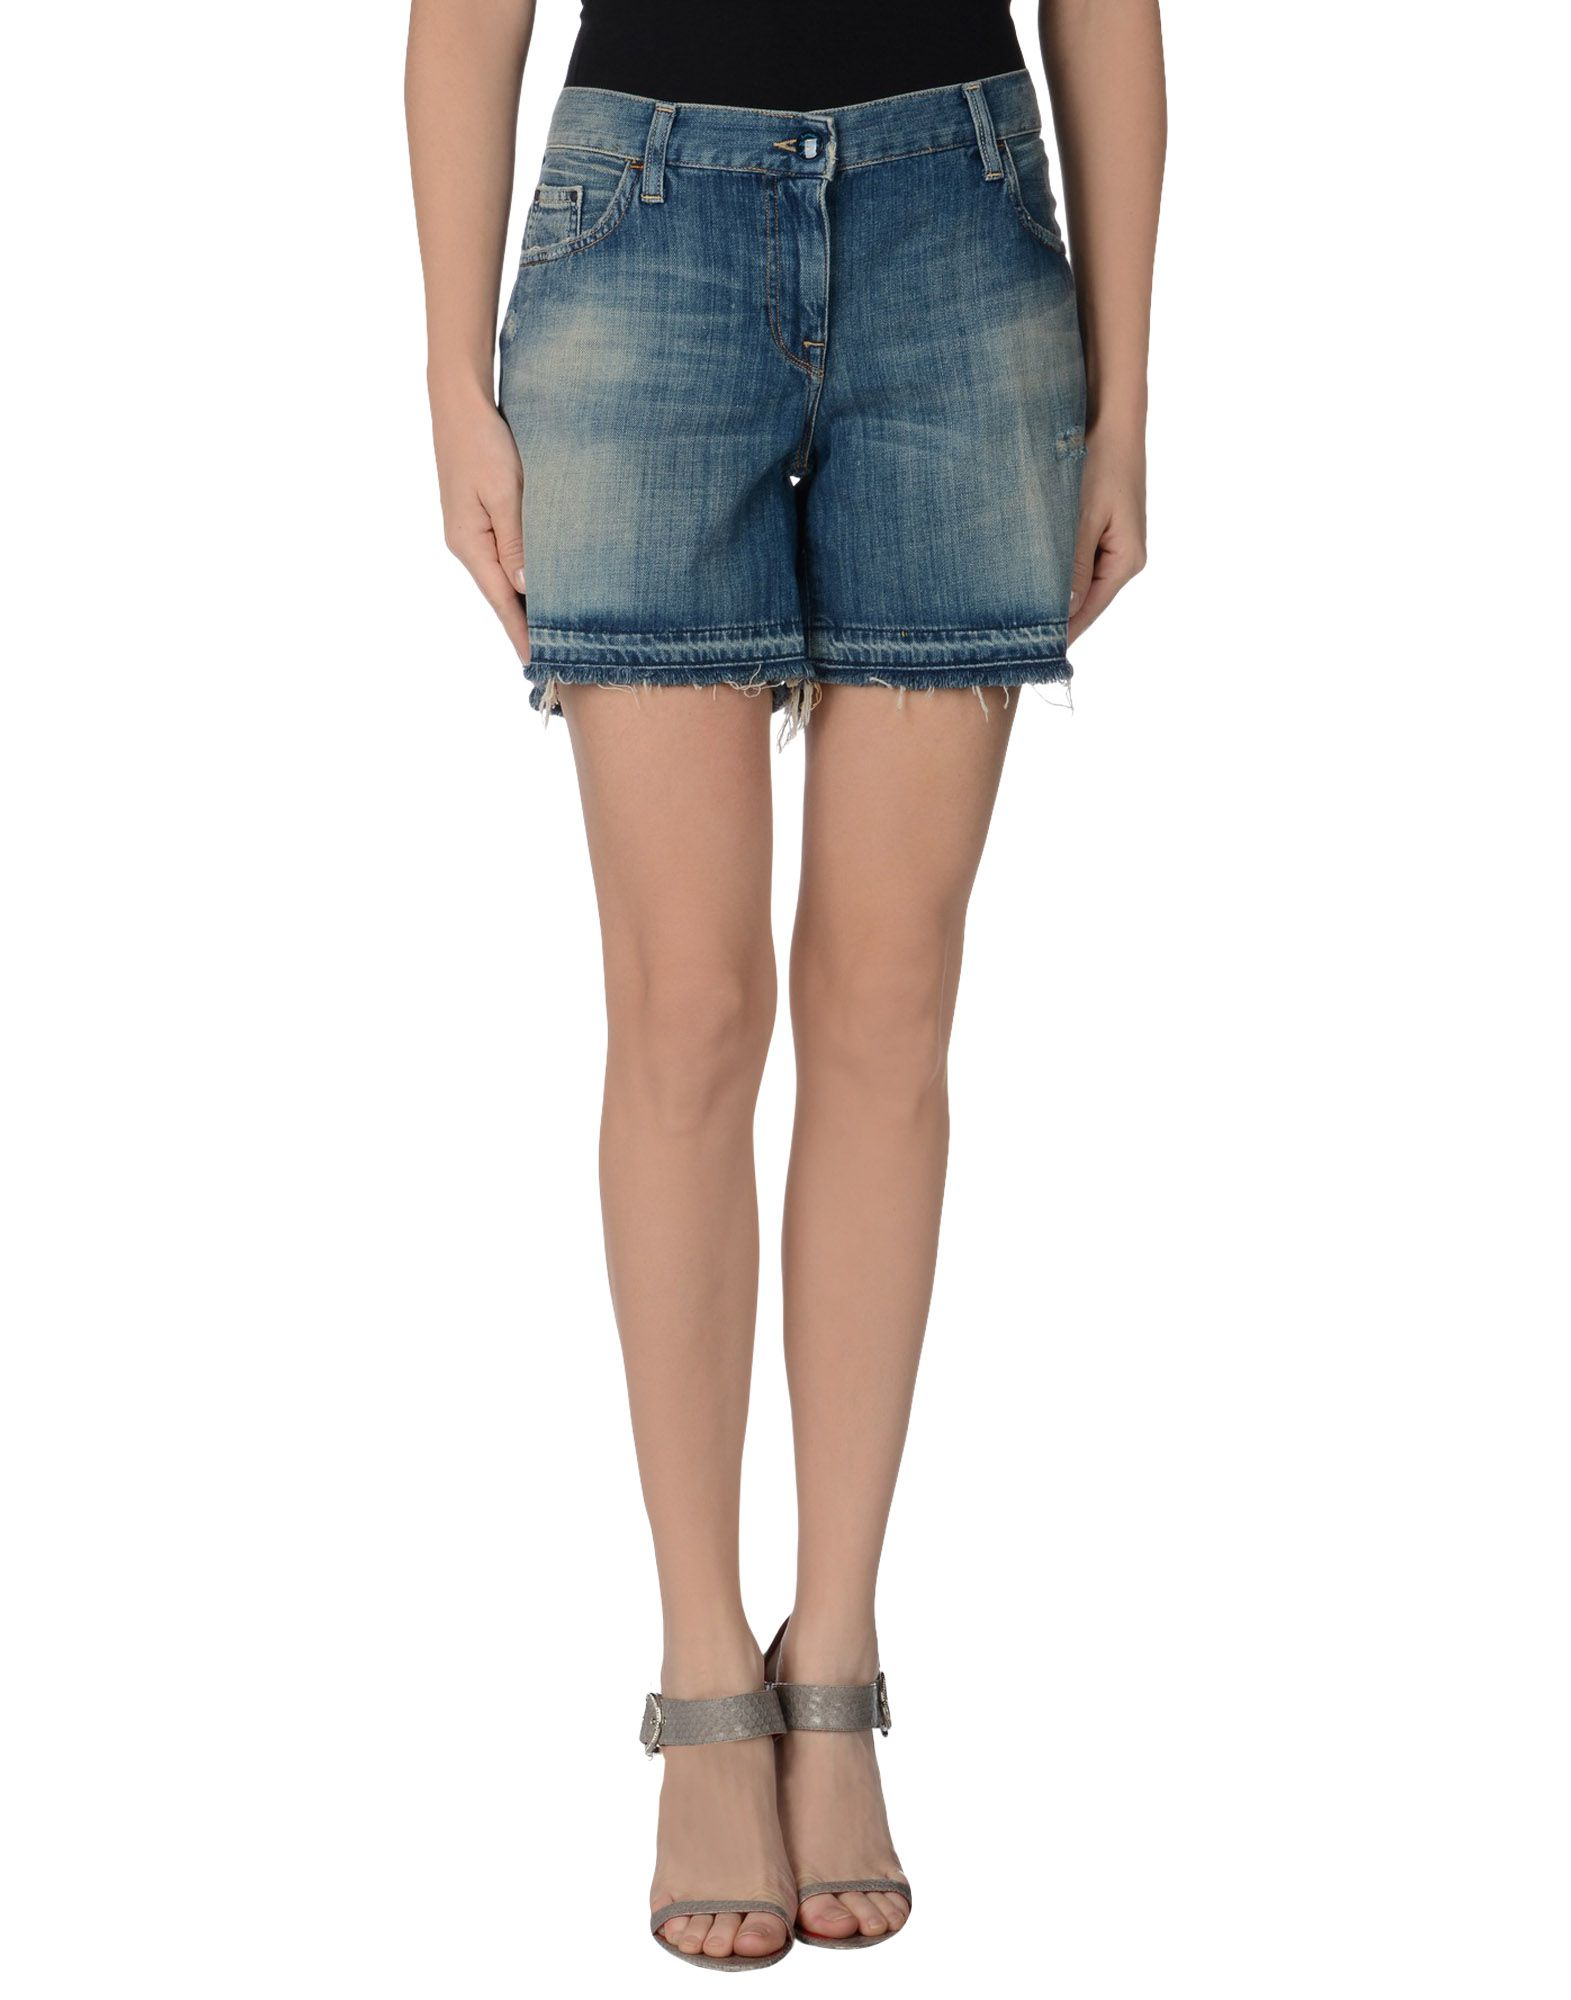 armani jeans denim bermudas in blue lyst. Black Bedroom Furniture Sets. Home Design Ideas